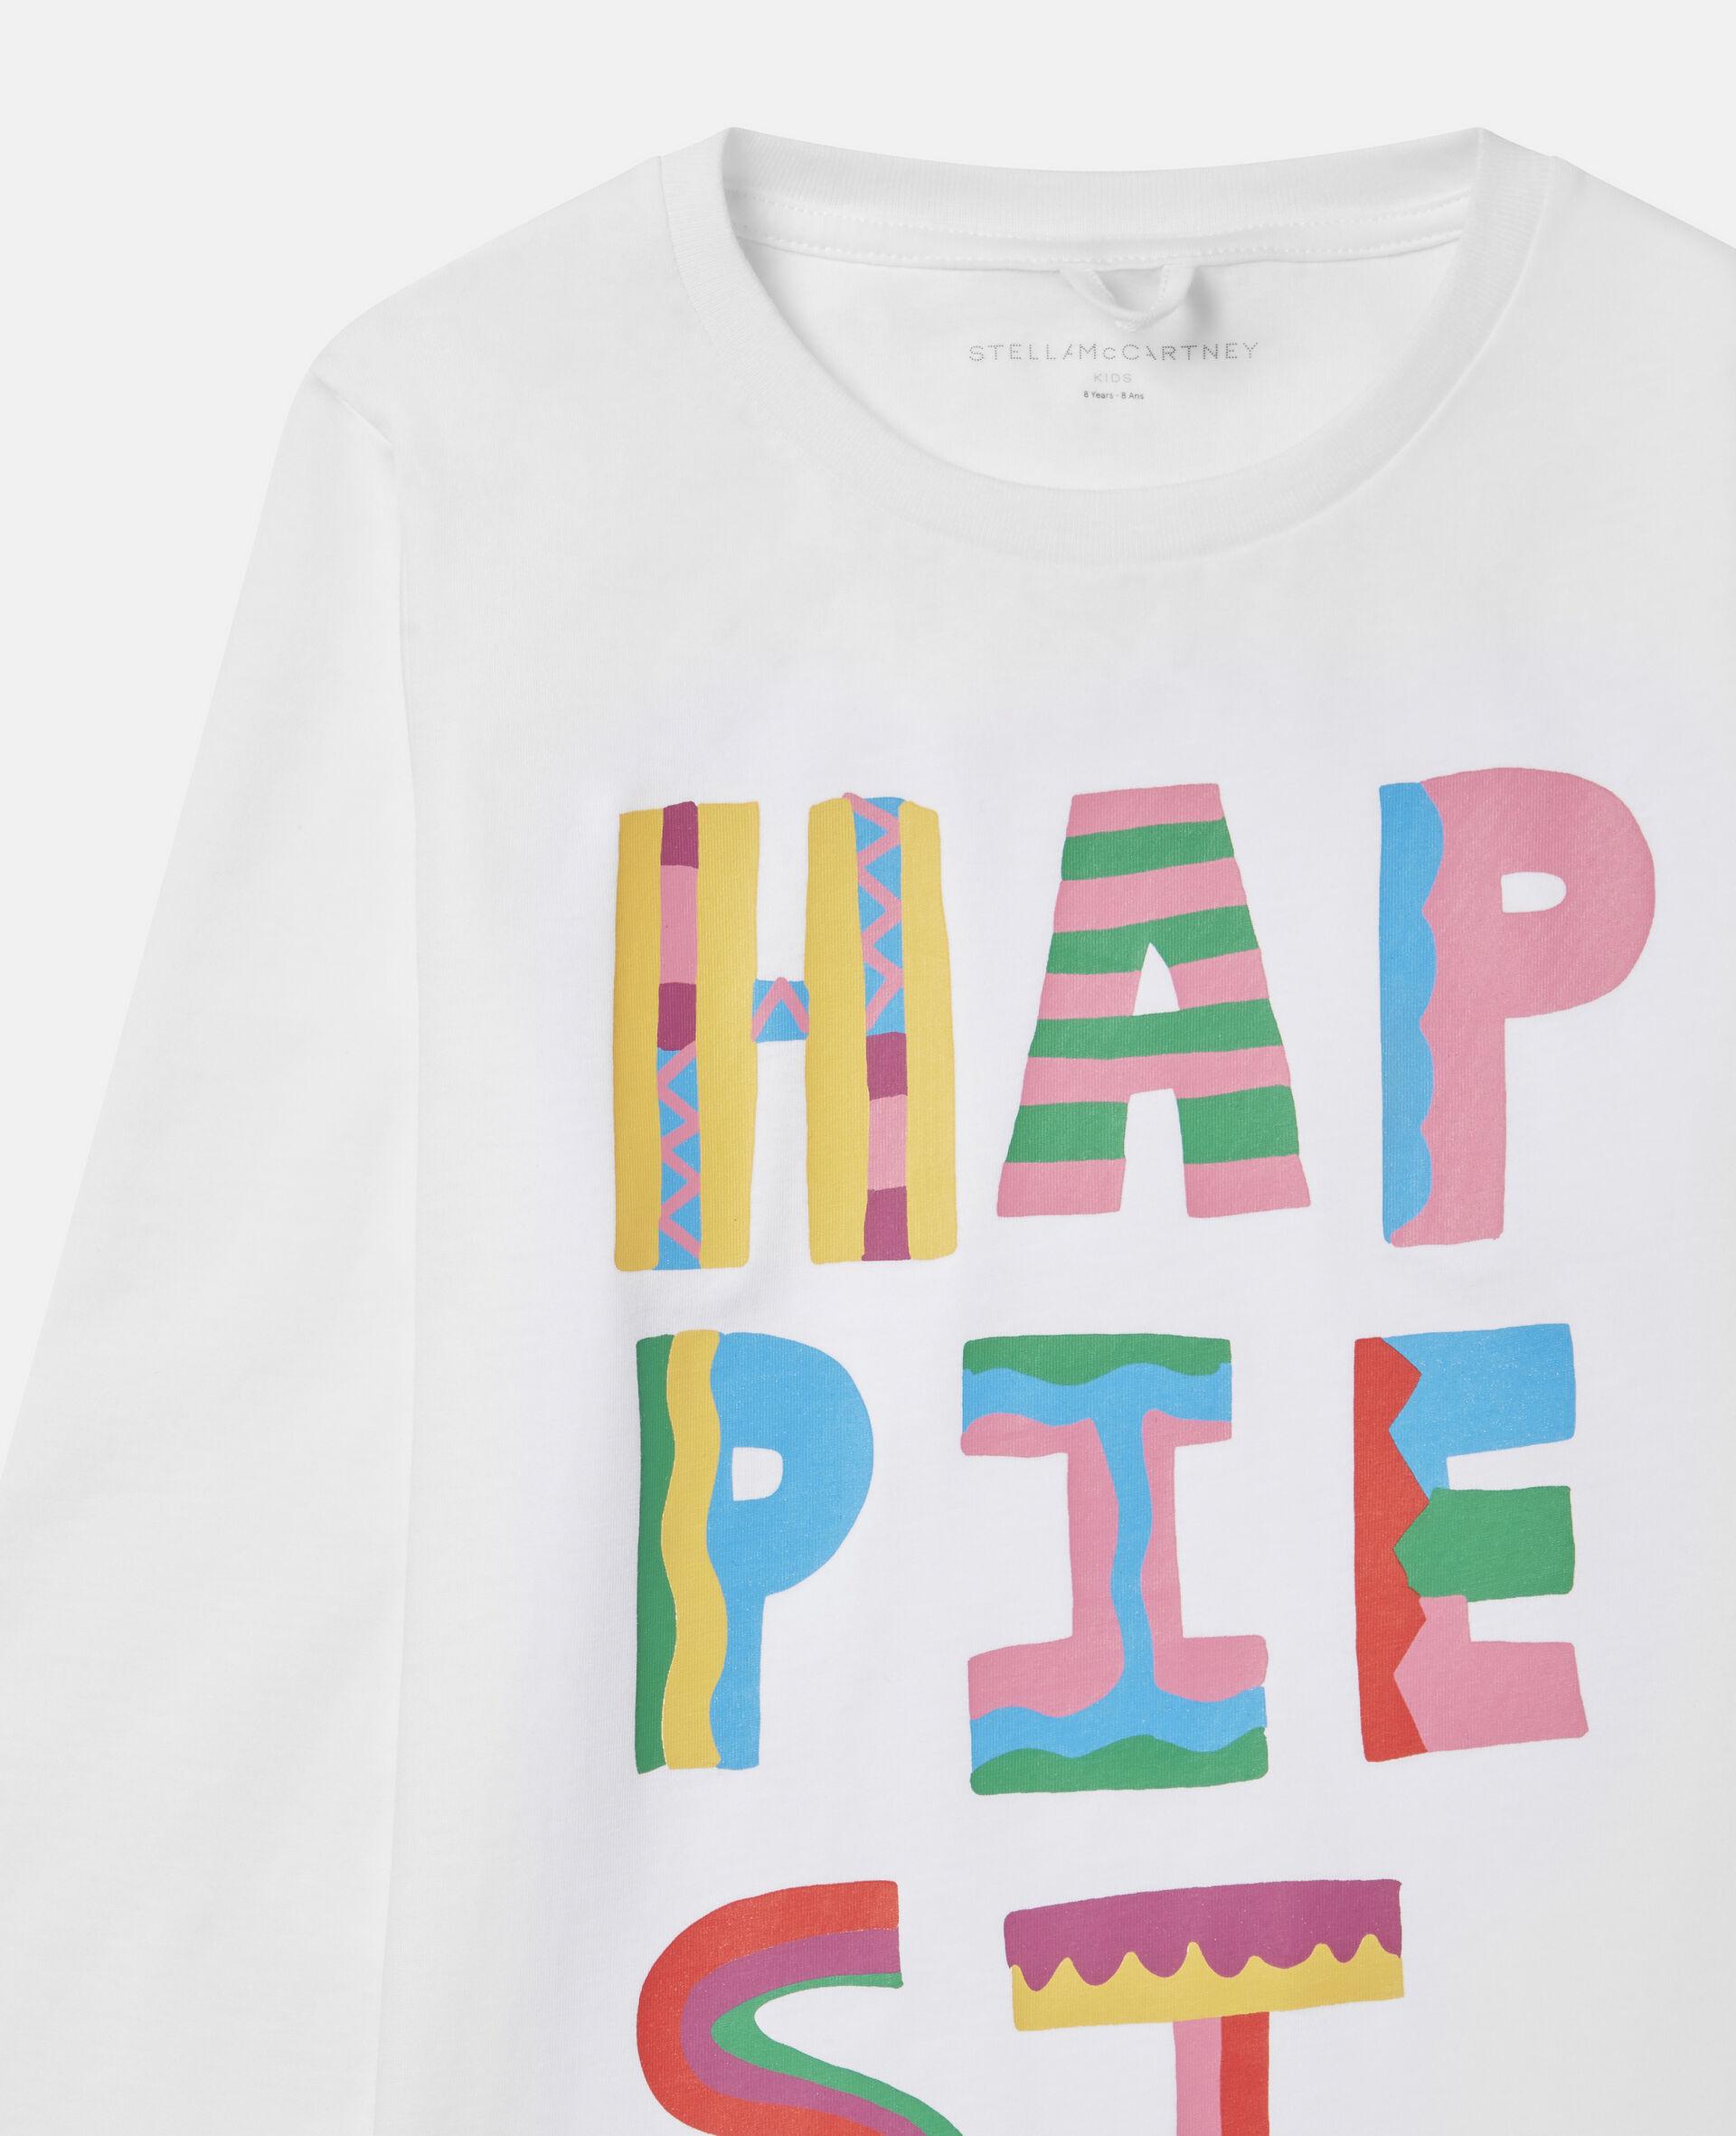 Top aus Baumwolle mit Happiest-Print-Weiß-large image number 1